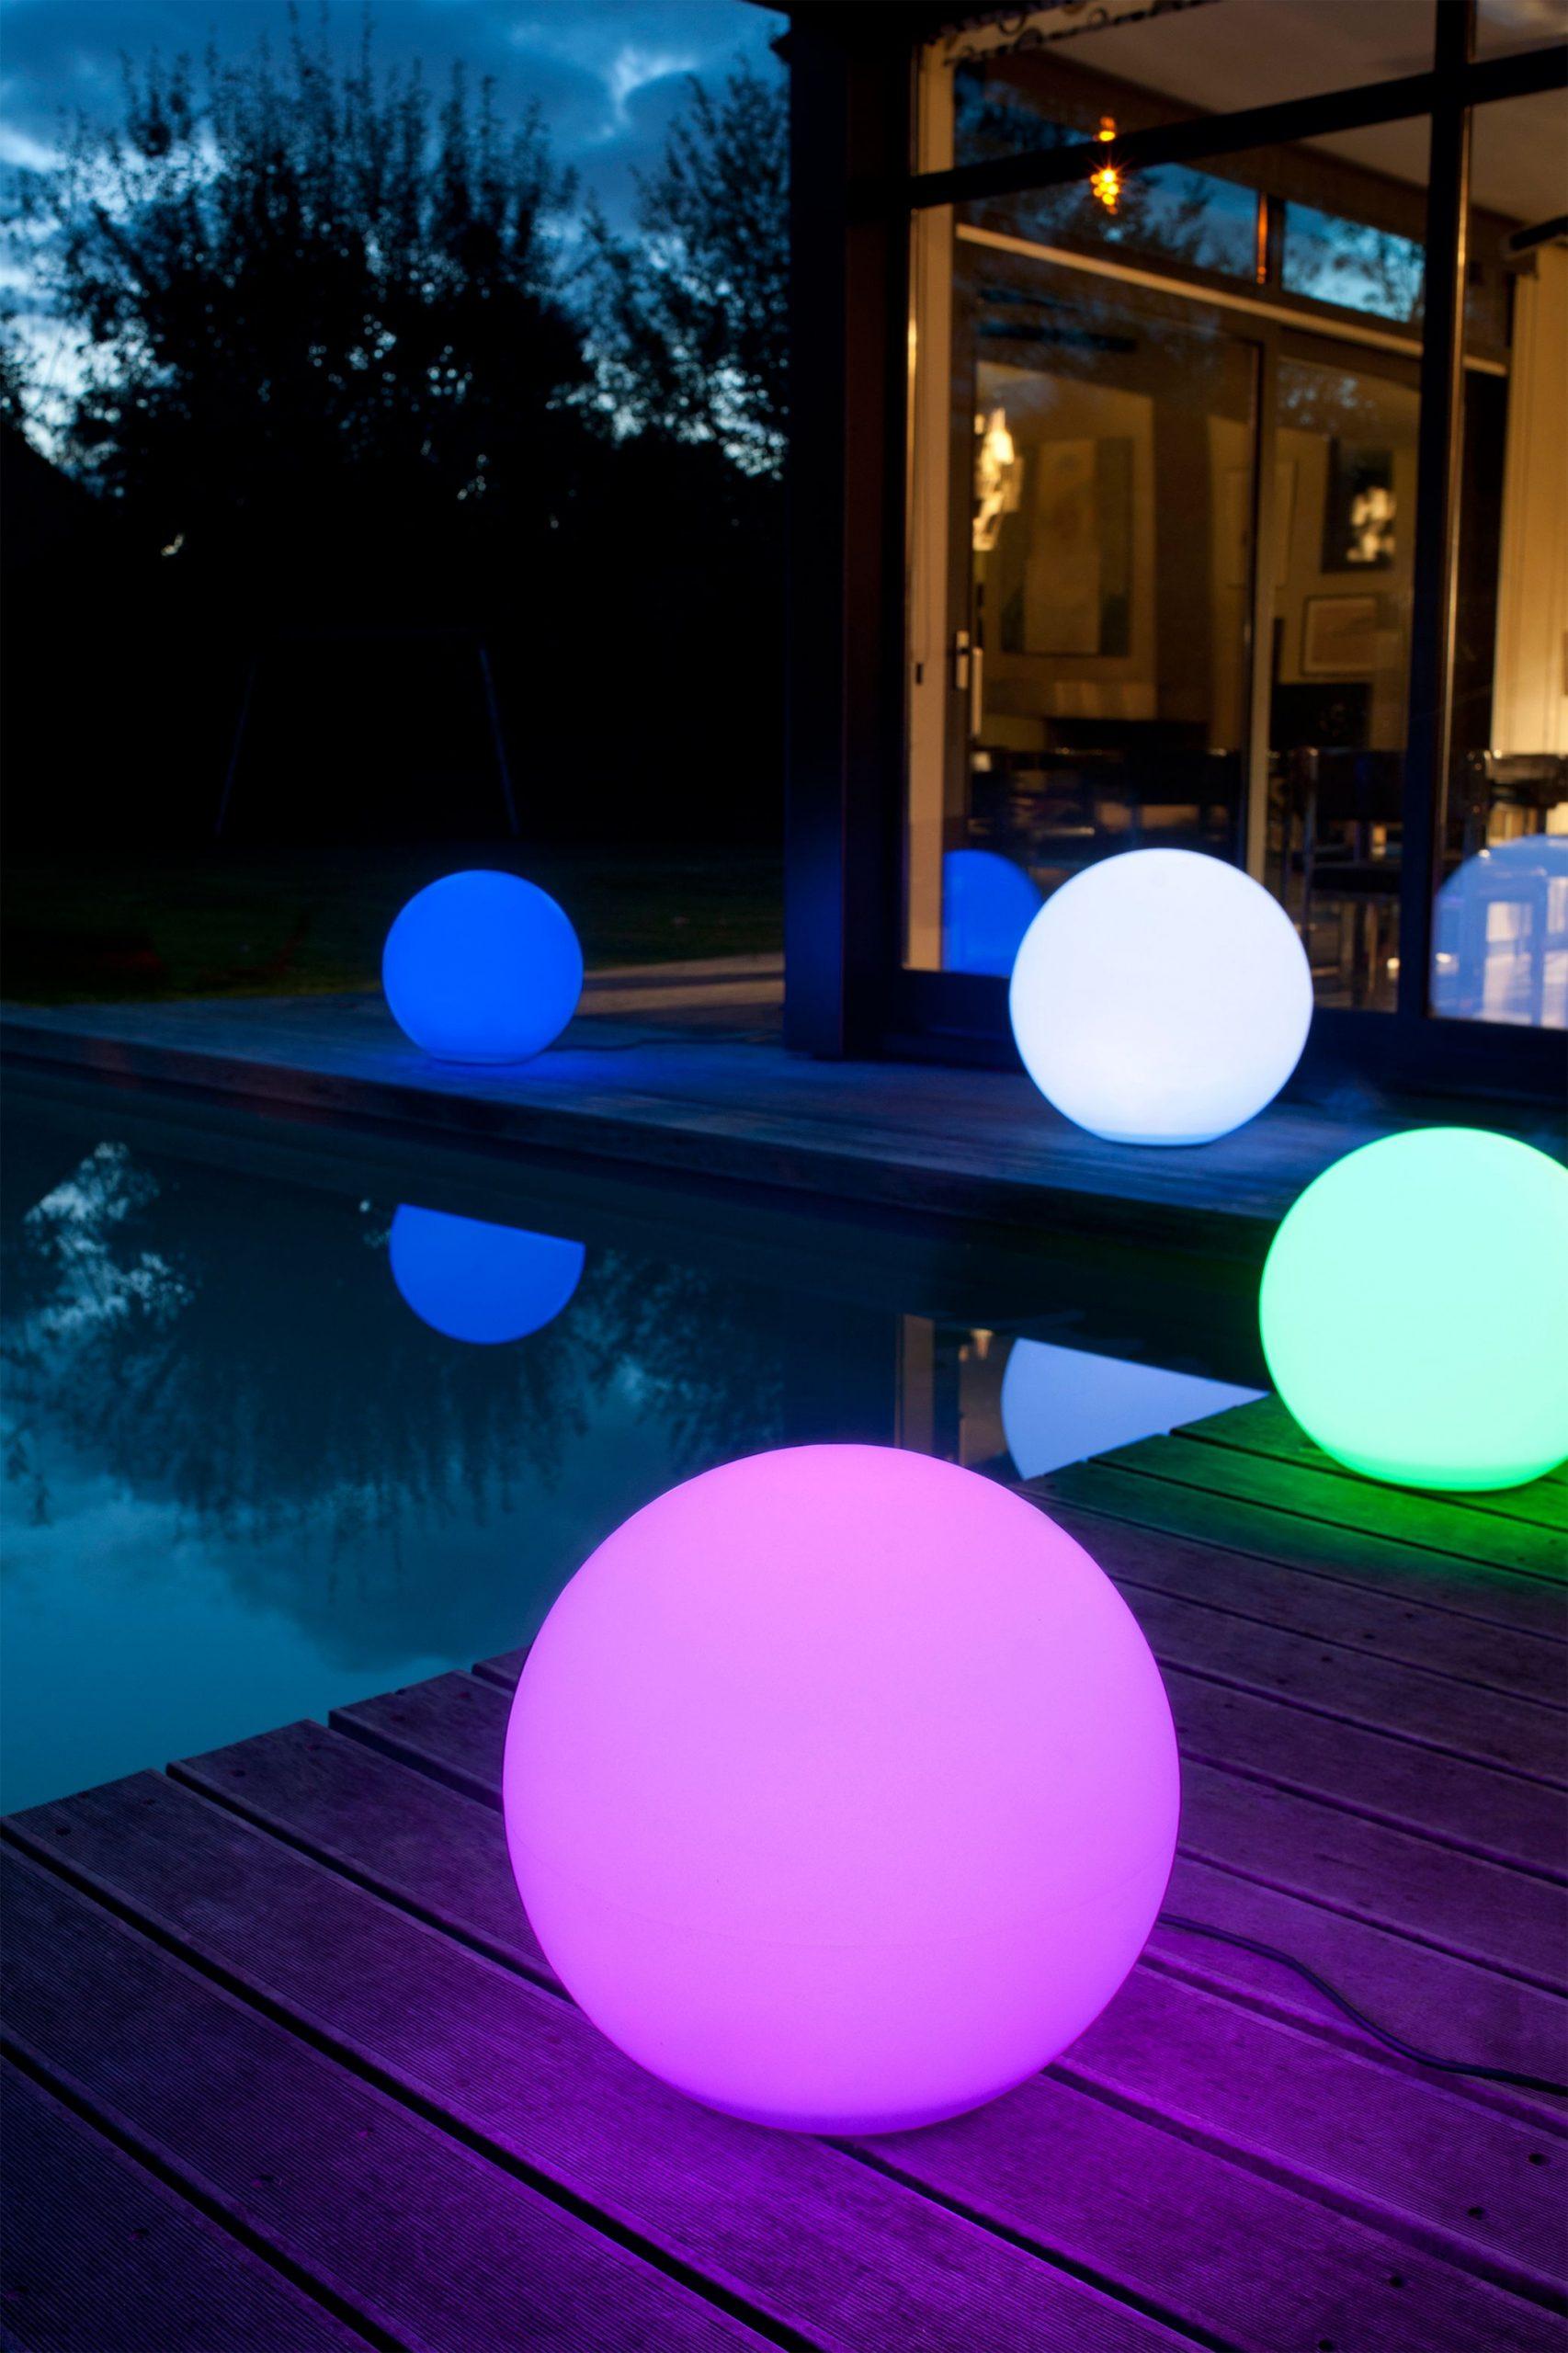 Boule Lumineuse Multicolore | Éclairage Extérieur, Boule ... intérieur Boule Lumineuse Piscine